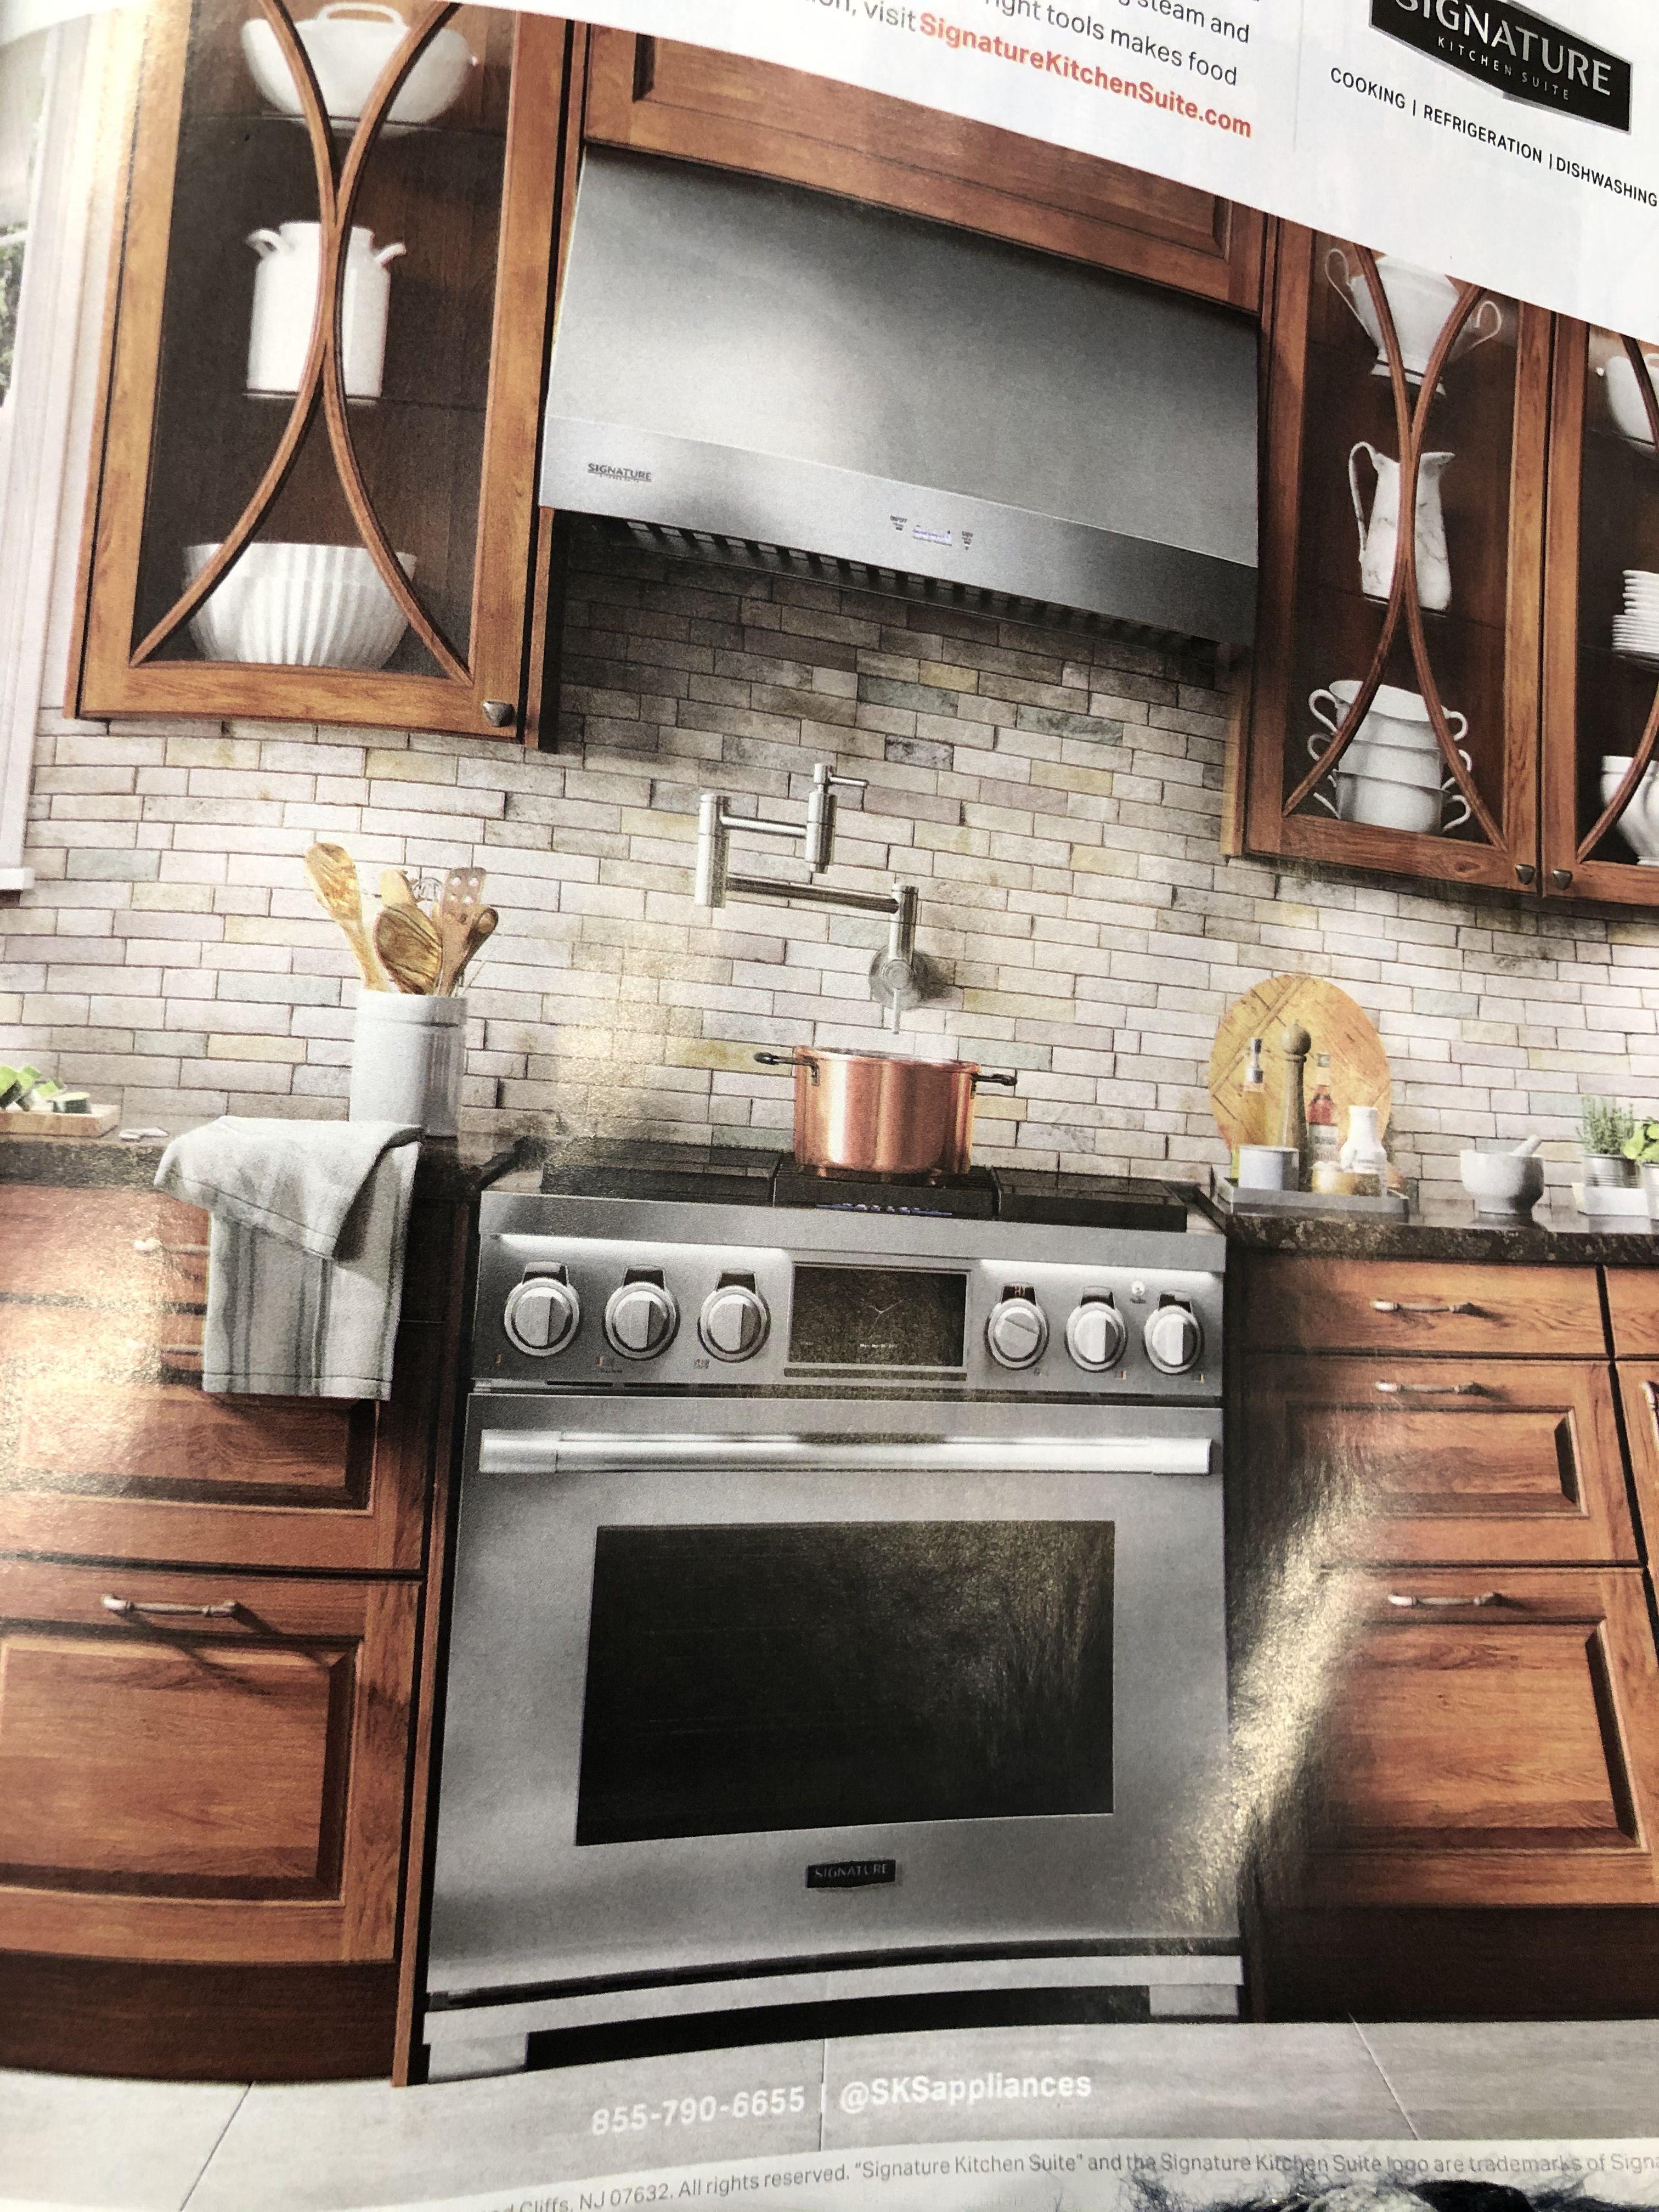 Pin By Mandyblewis On Kitchen In 2020 Kitchen Kitchen Cabinets Home Decor